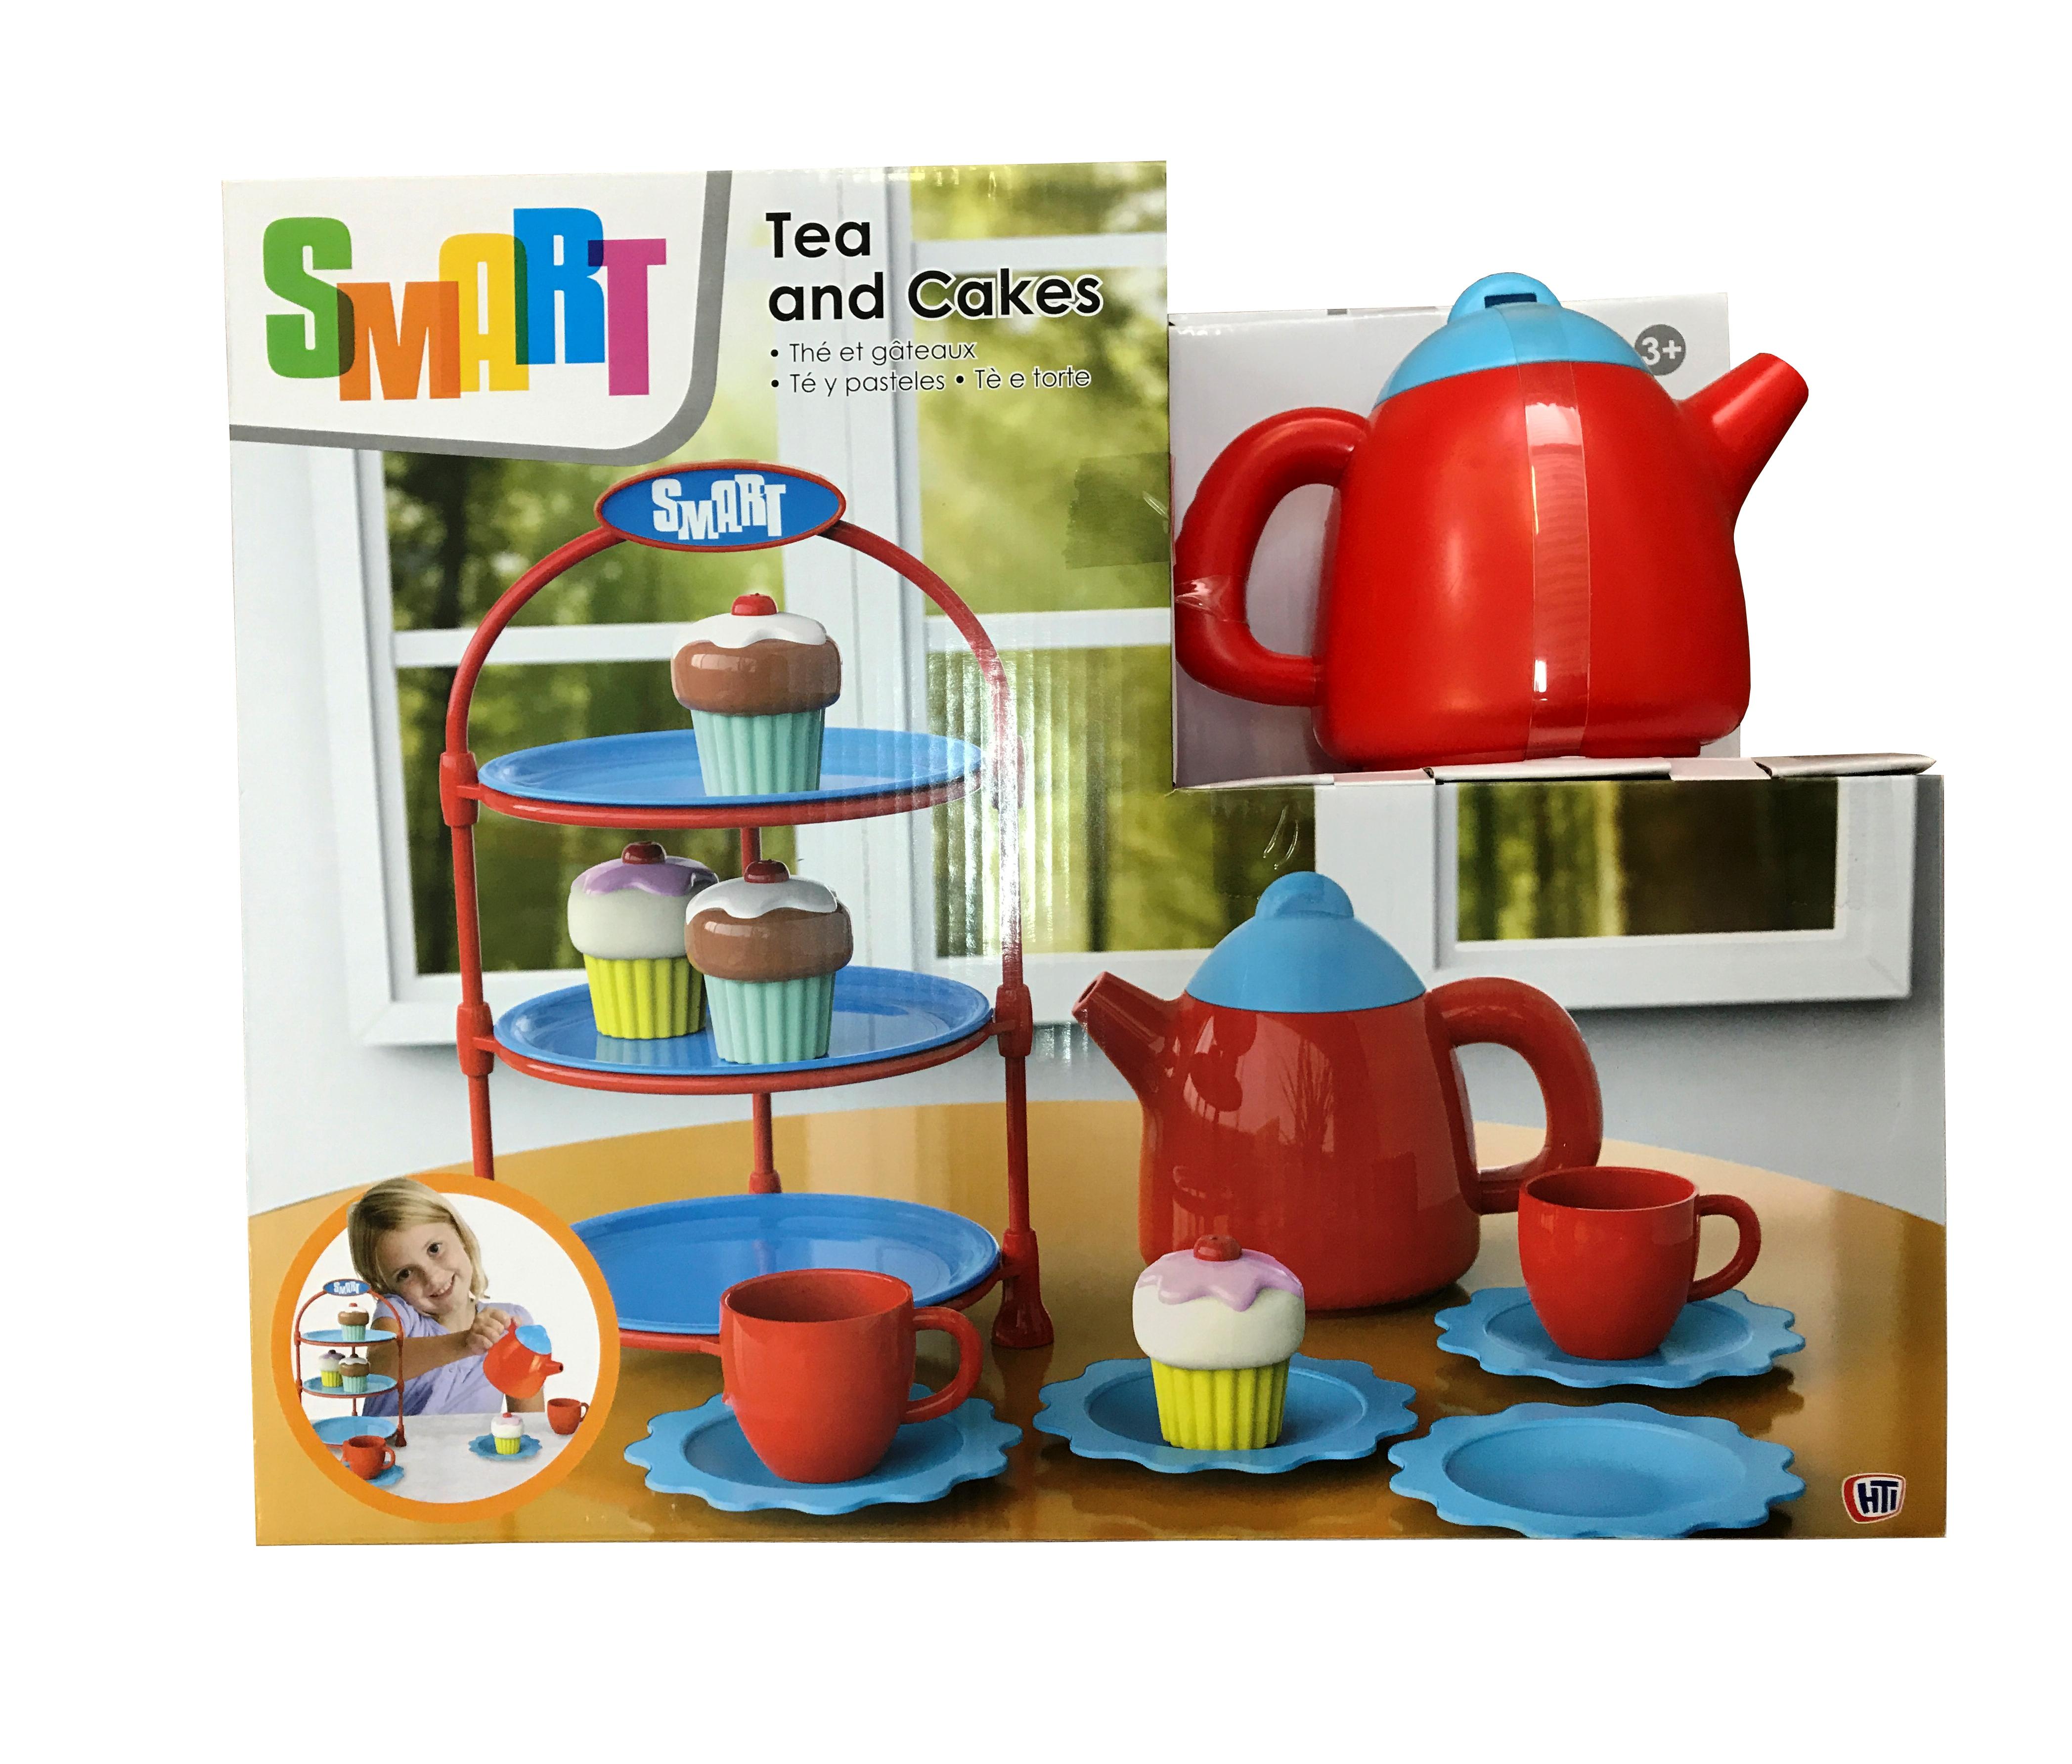 HTI Набор для чая с кексами Smart hti стиральная машина smart